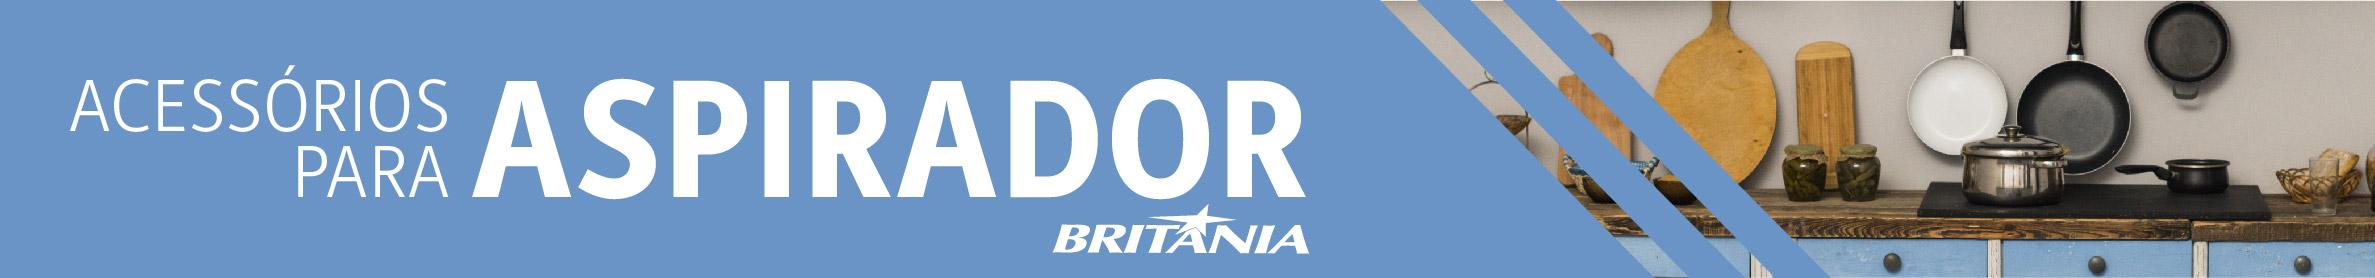 aspirador-britania-tarja